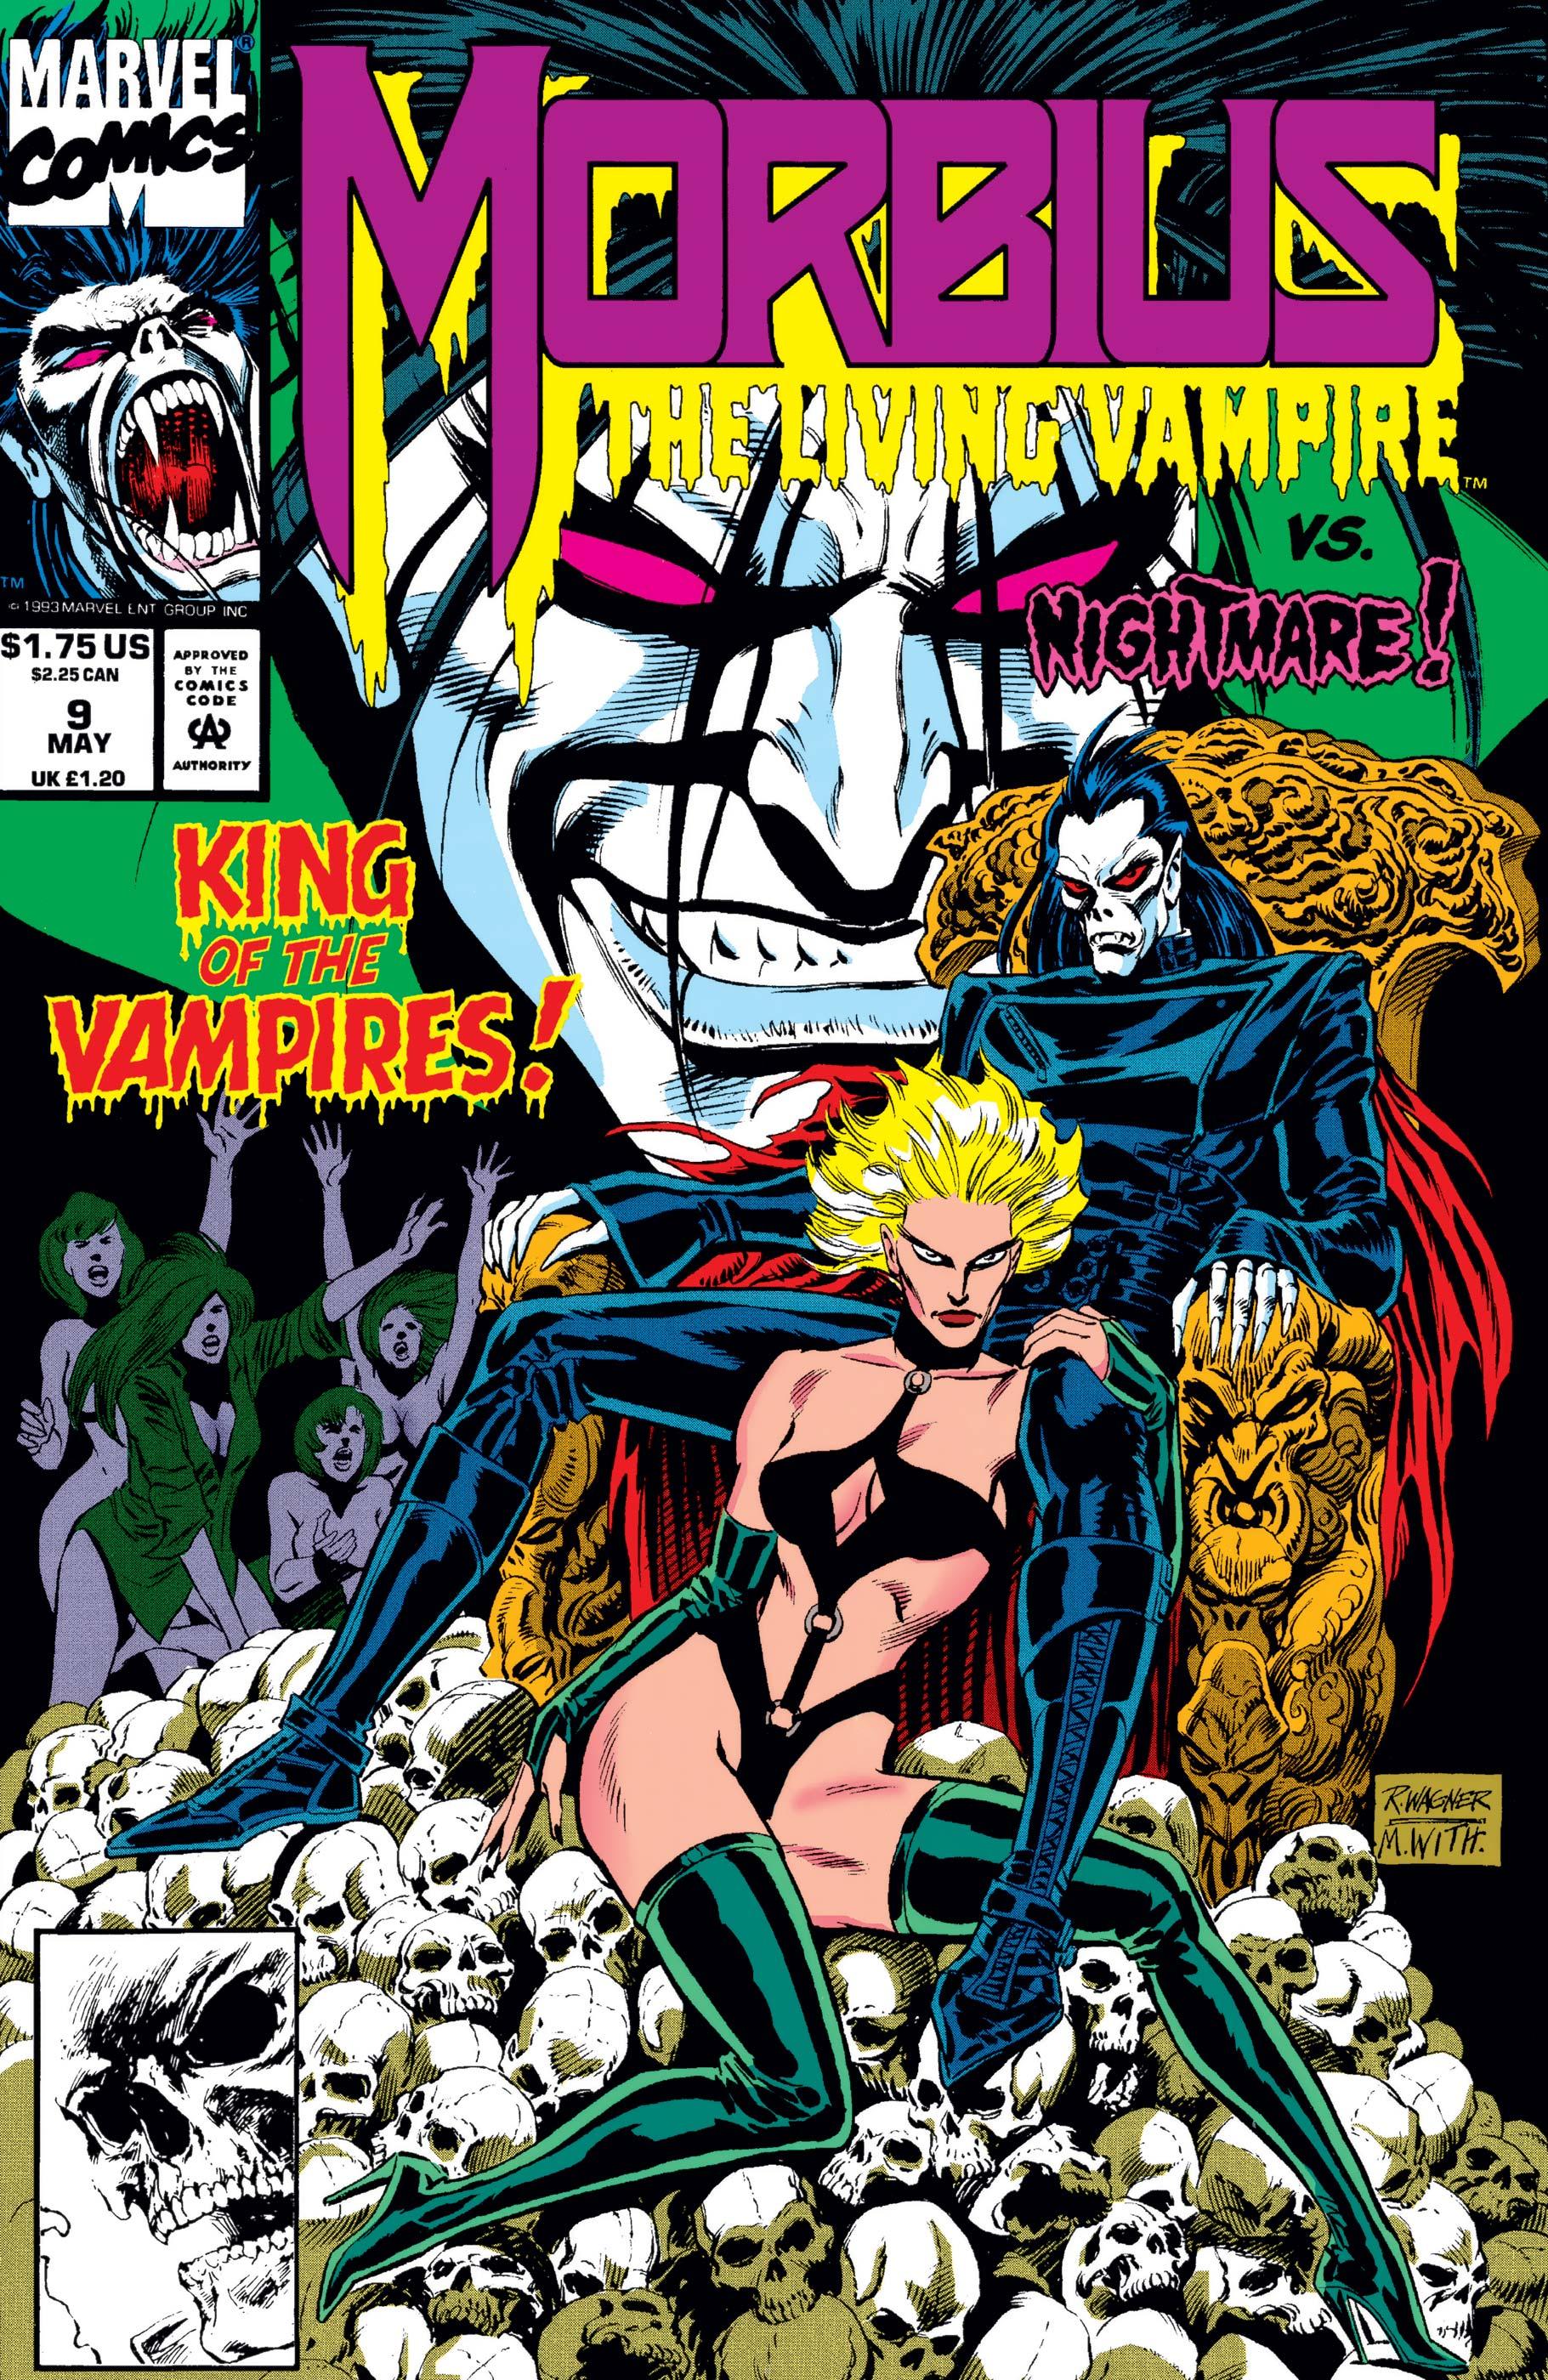 Morbius: The Living Vampire (1992) #9